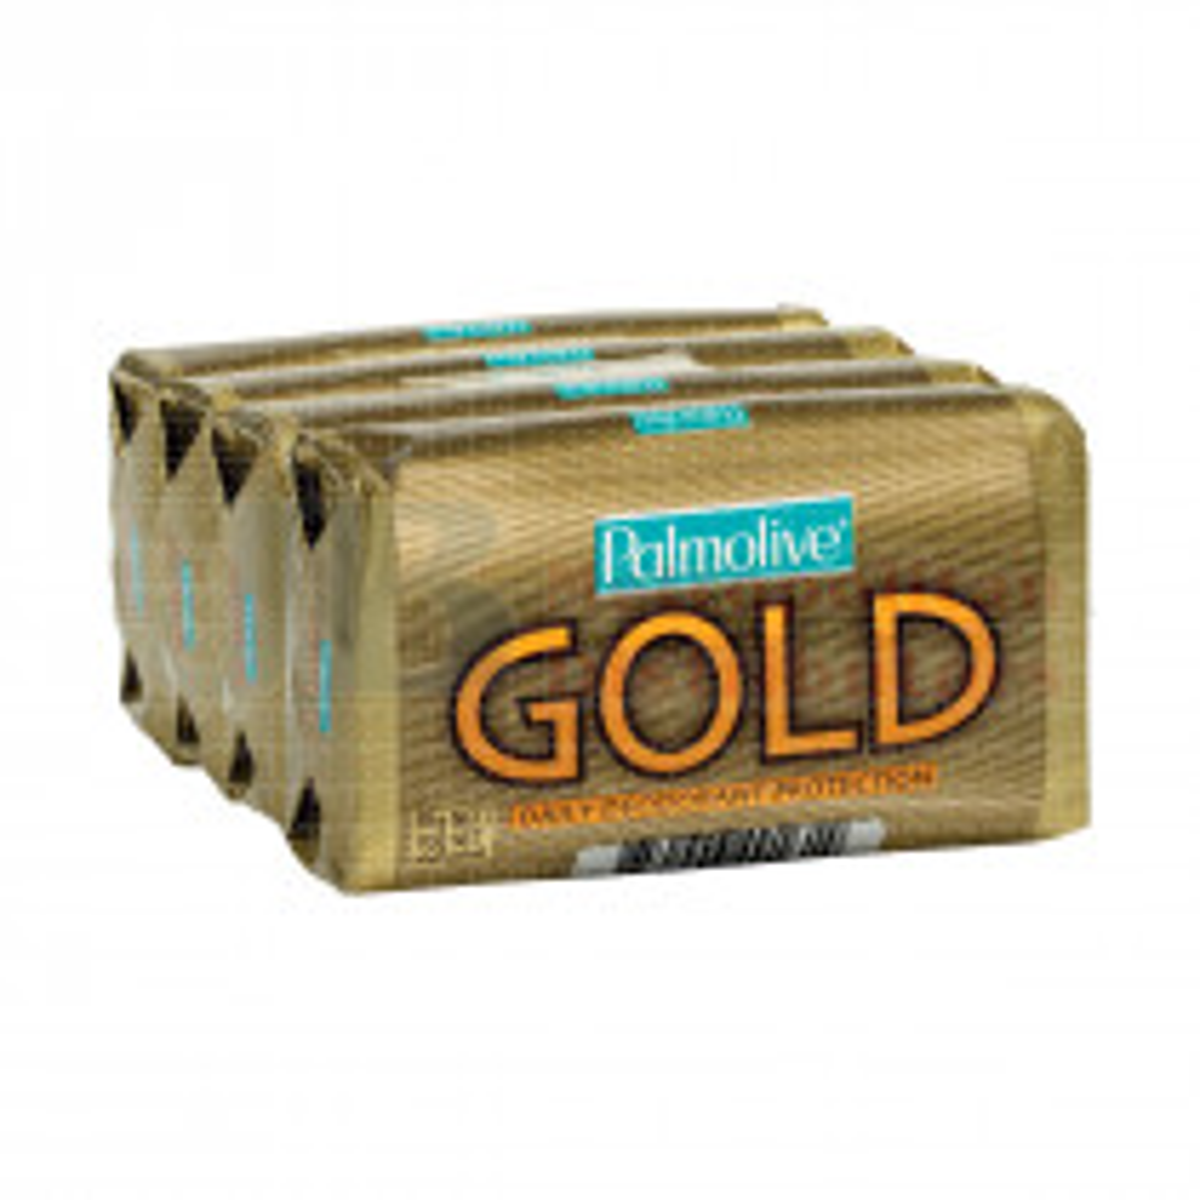 90G 4PK PALMOLIVE GOLD SOAP